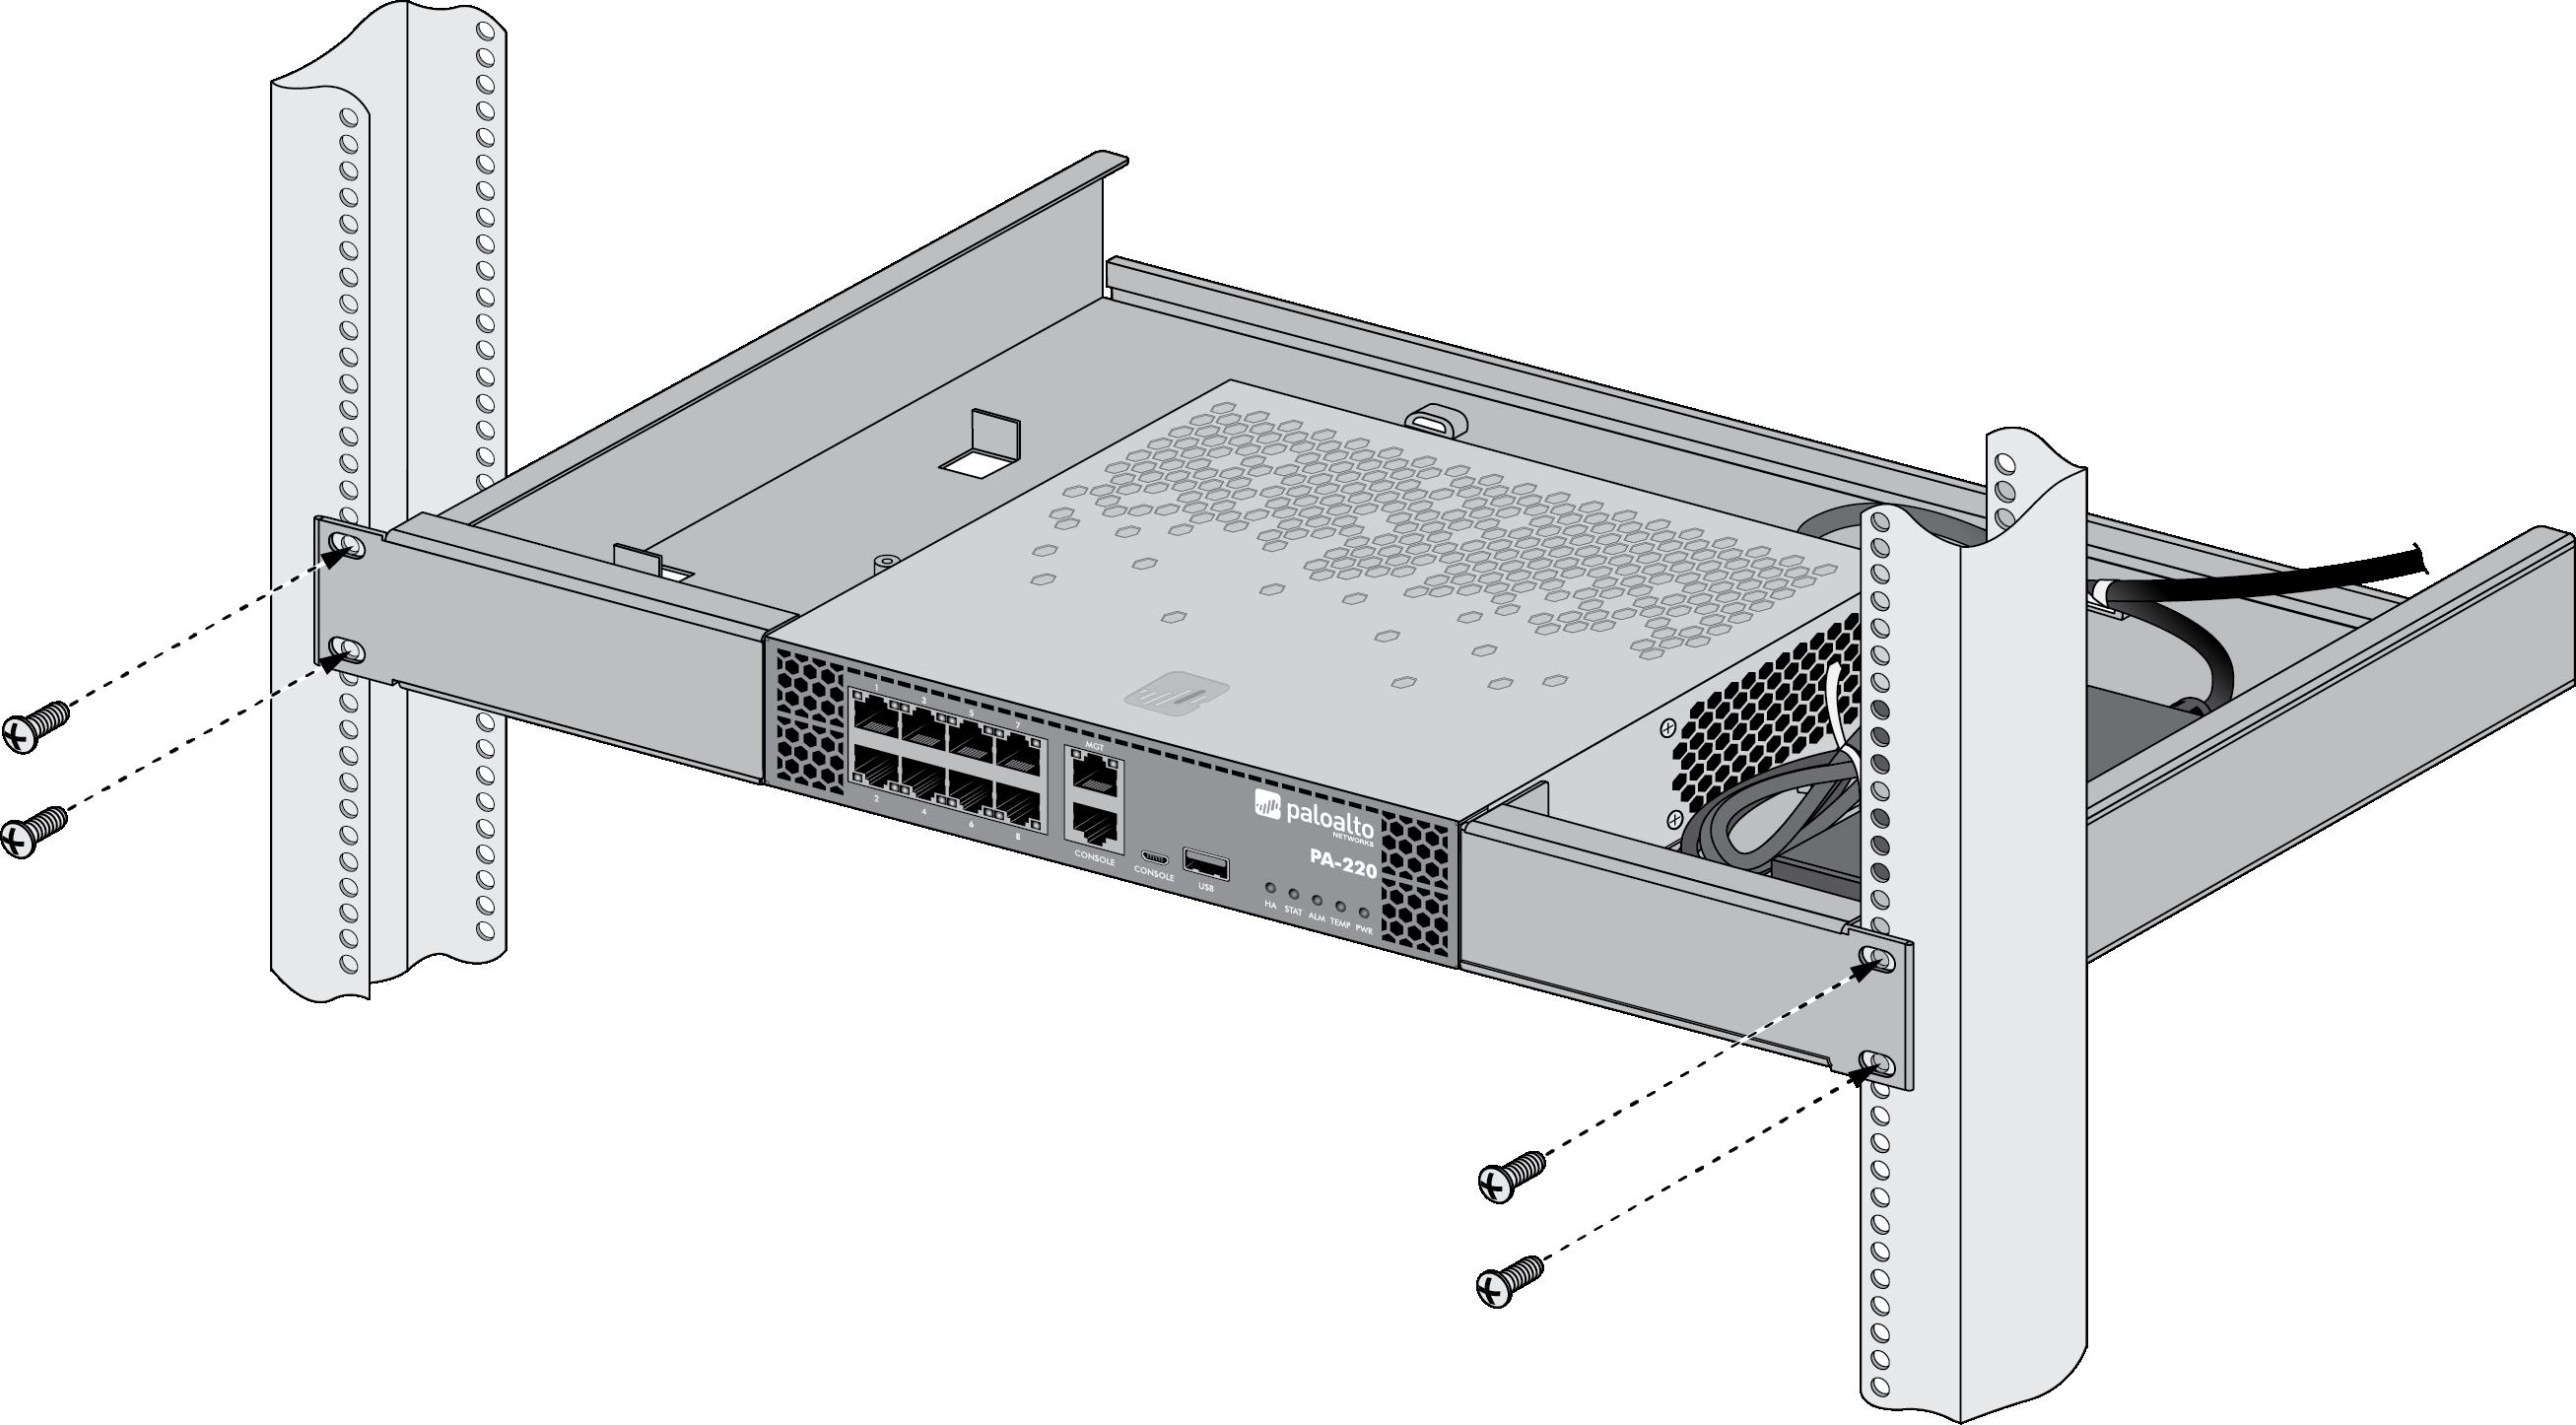 pa-220-rack-single-4